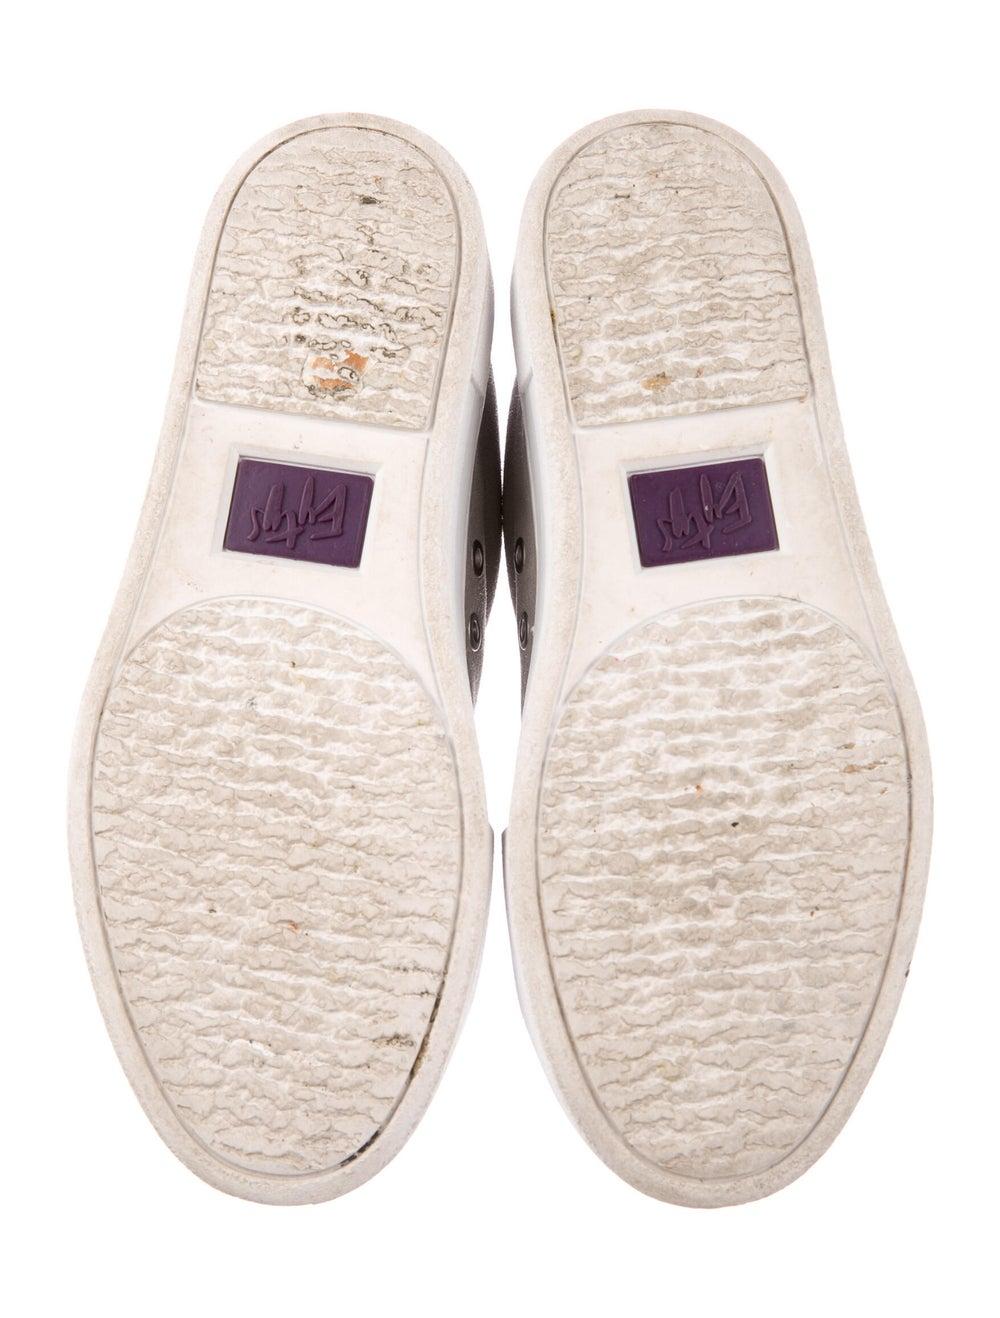 Eytys Suede Sneakers Grey - image 5